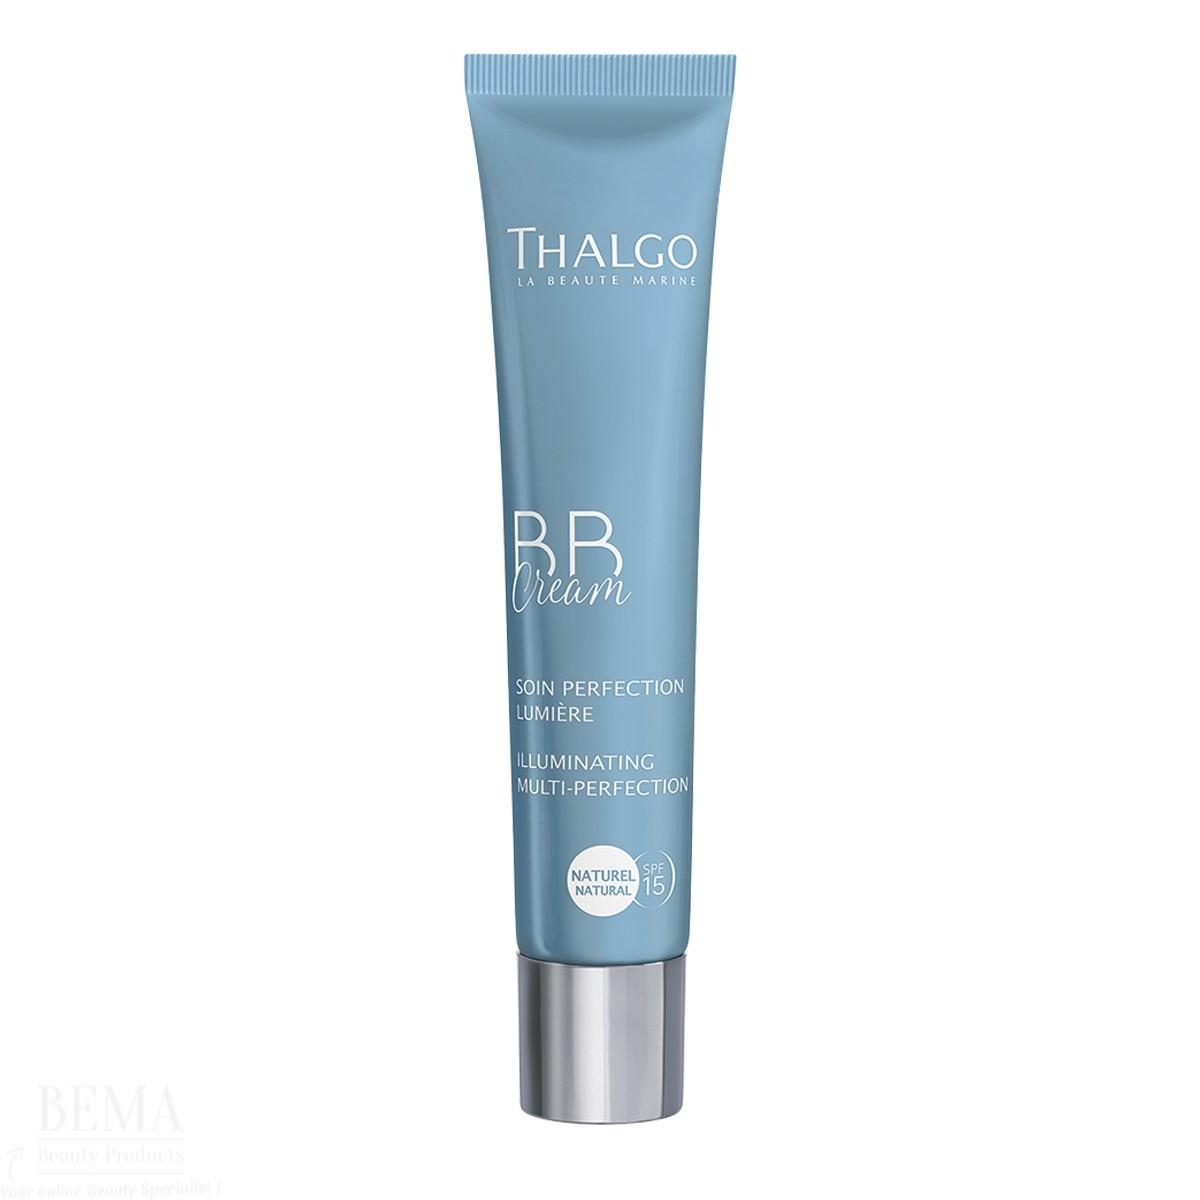 Thalgo bb cream soin perfection lumiere naturel spf15 40ml